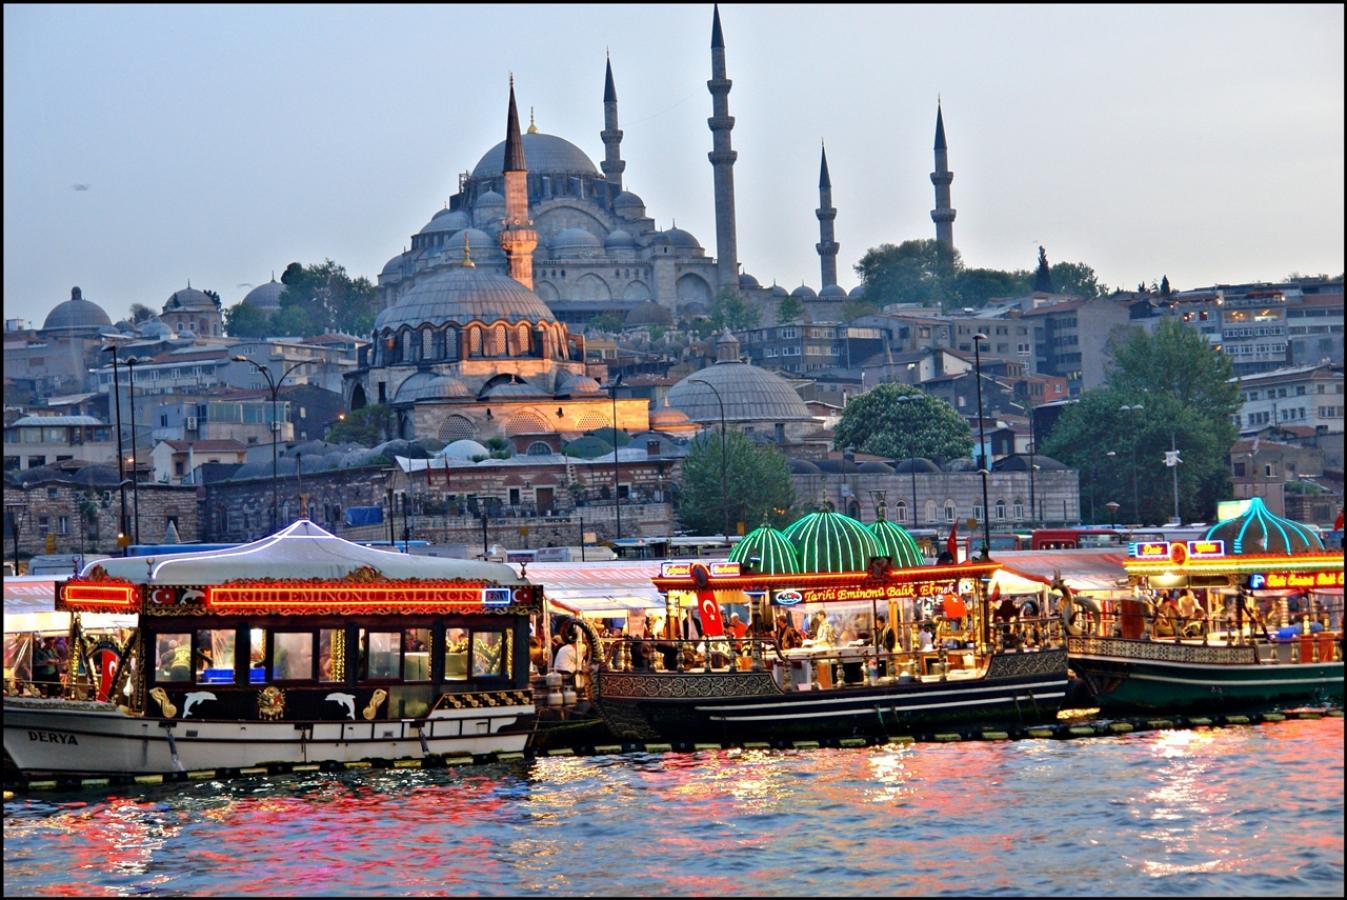 Cali4travel - Bosphorus-Cruise